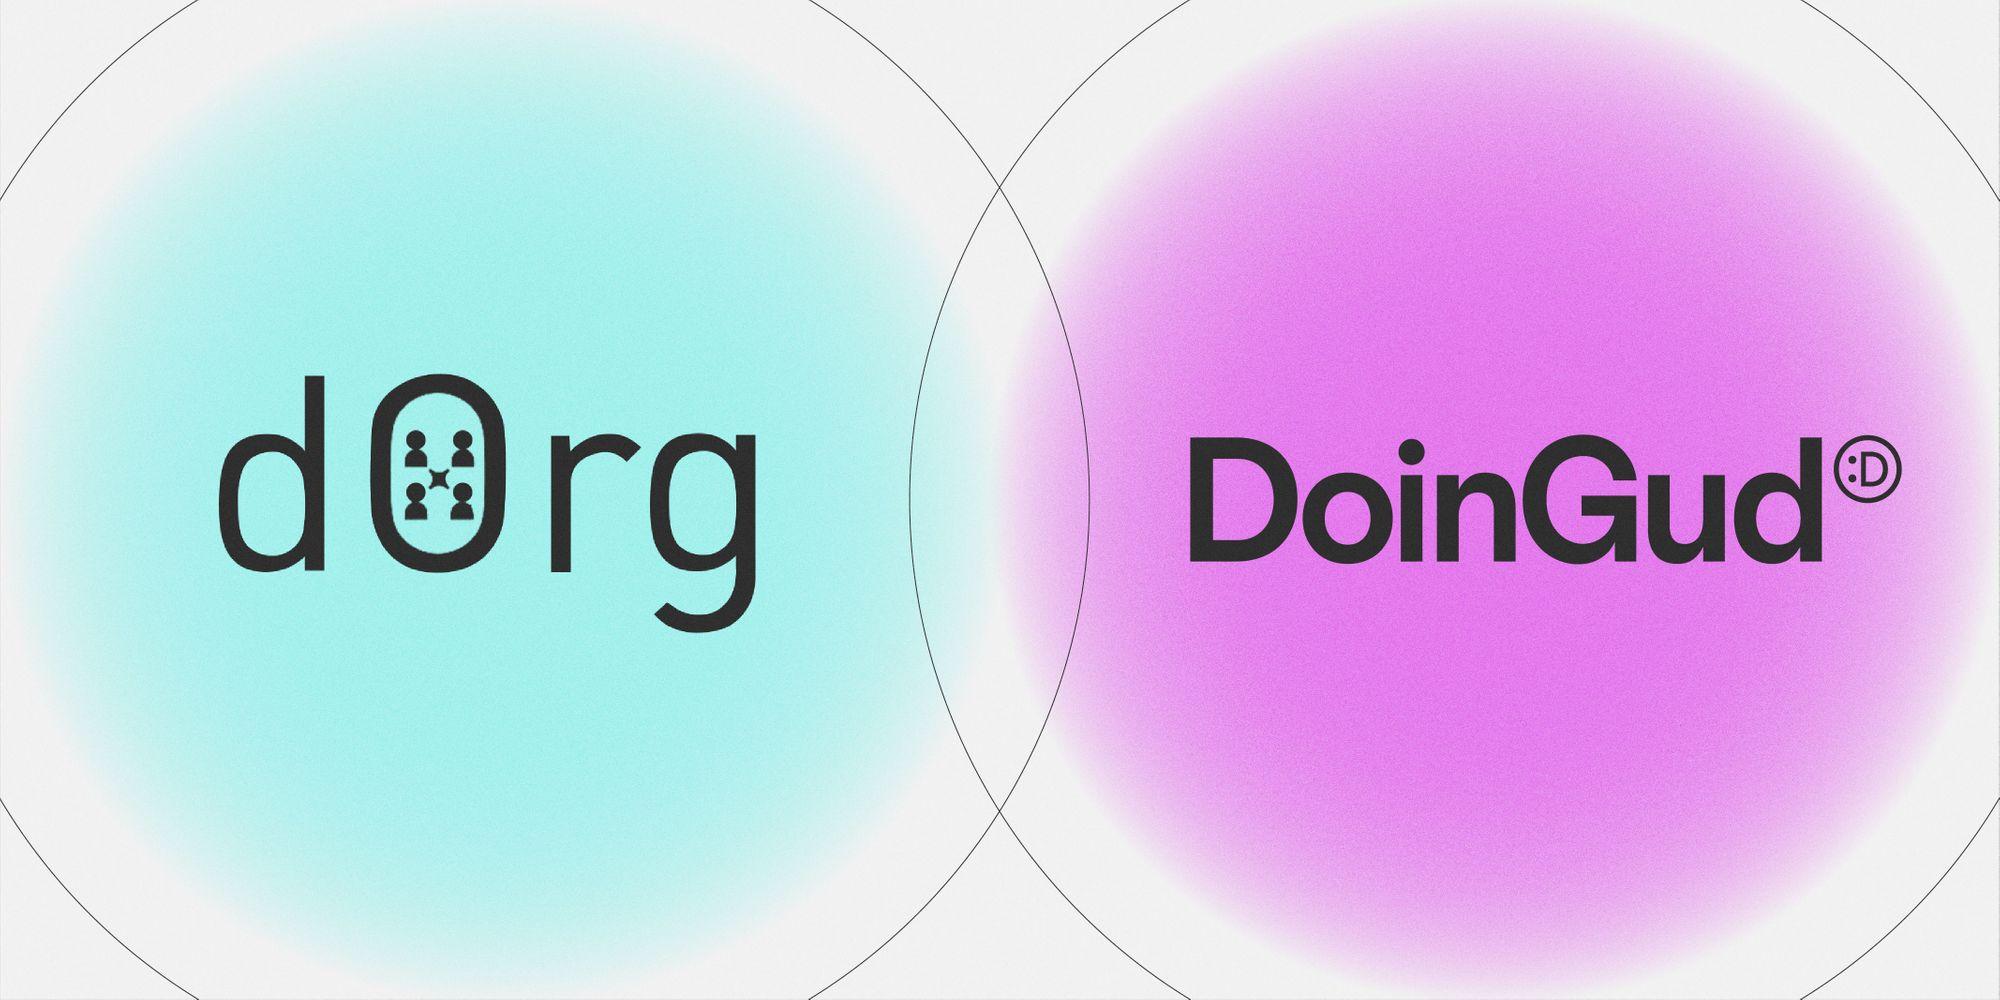 dOrg and DoinGud Establish A Technical Partnership